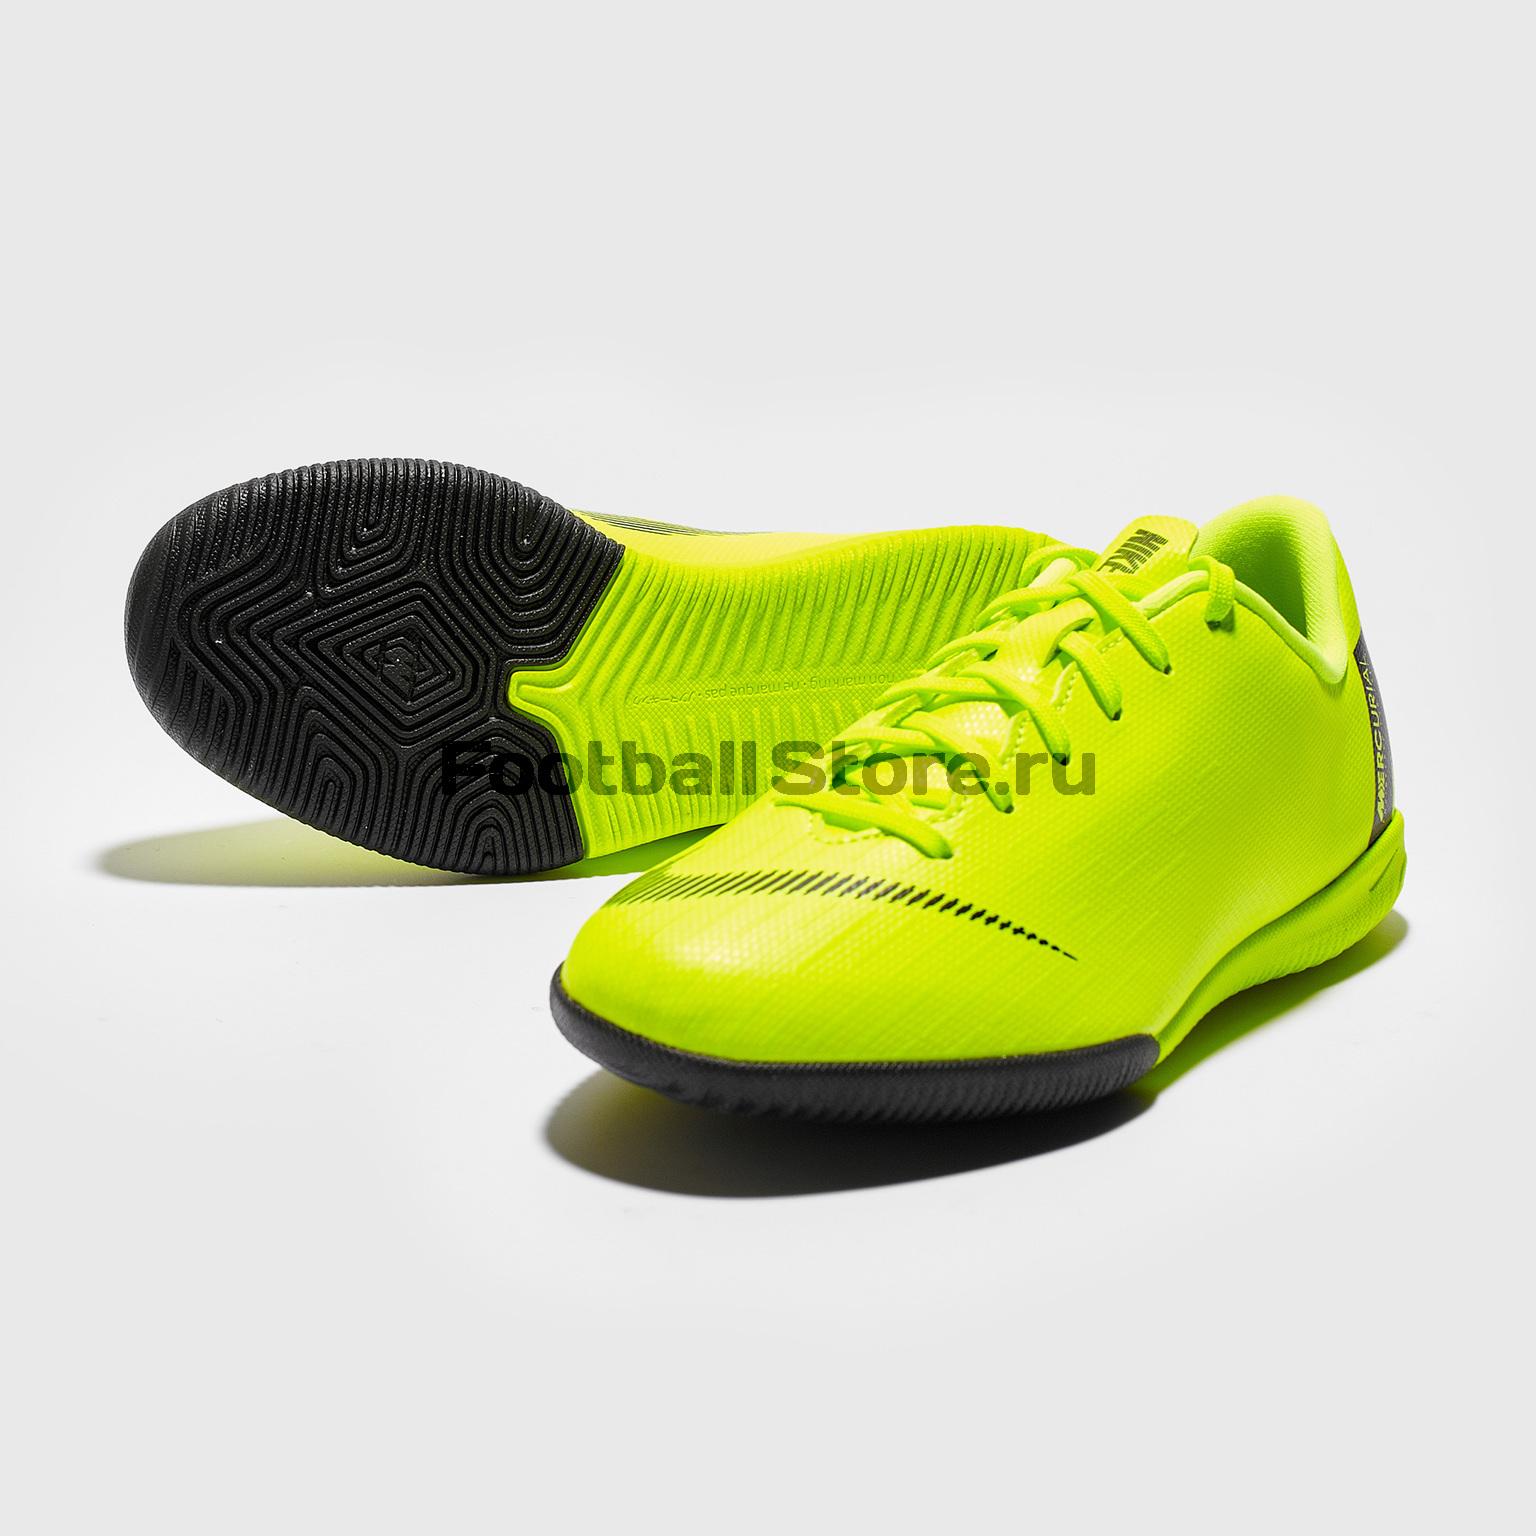 a19eb3f15fb2d4 Футзалки детские Nike Vapor 12 Academy GS IC AJ3101-701 – купить в ...